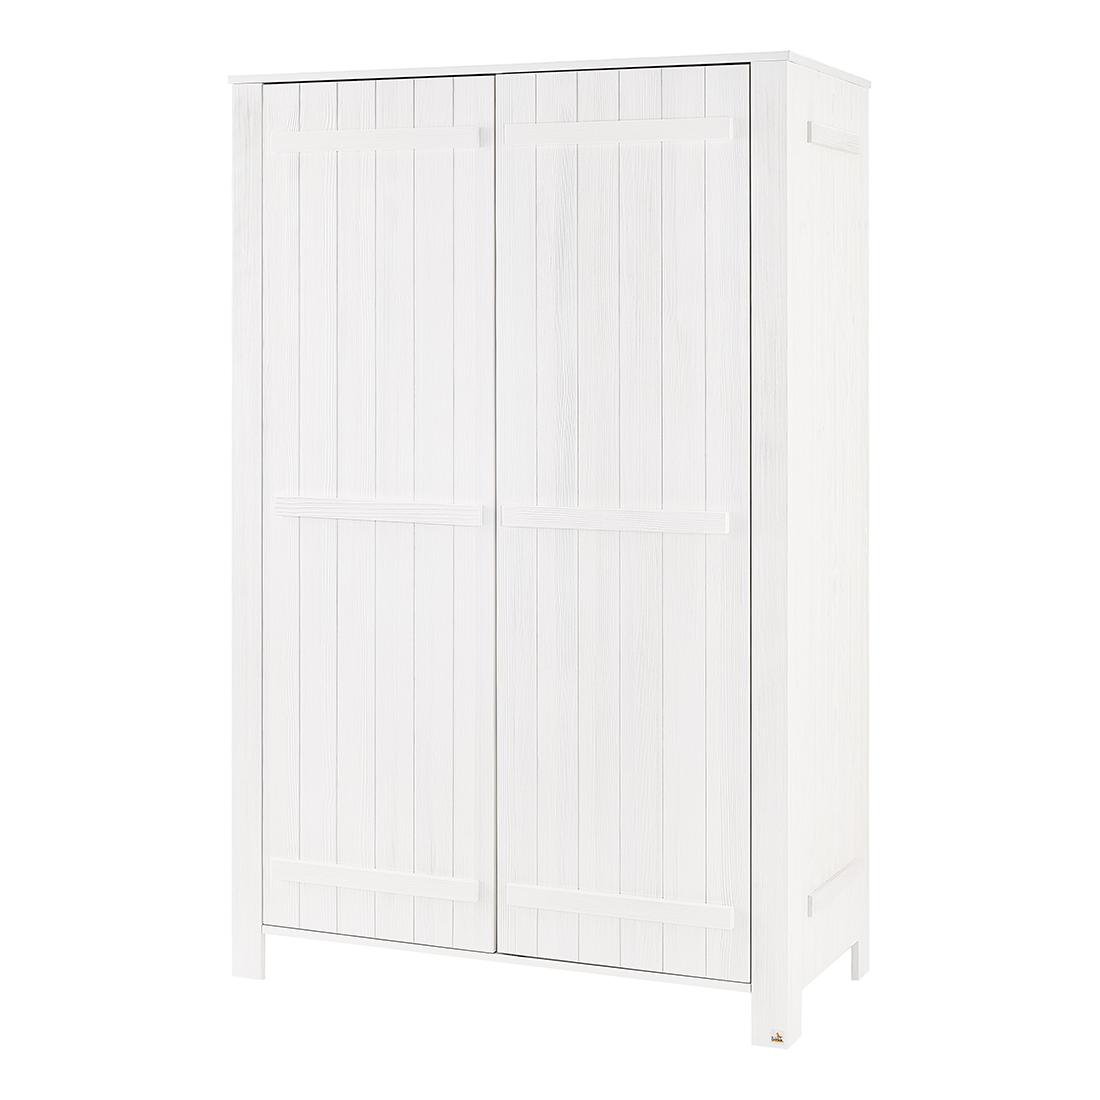 pinolino armoire 2 portes en bois d pic a collection count. Black Bedroom Furniture Sets. Home Design Ideas